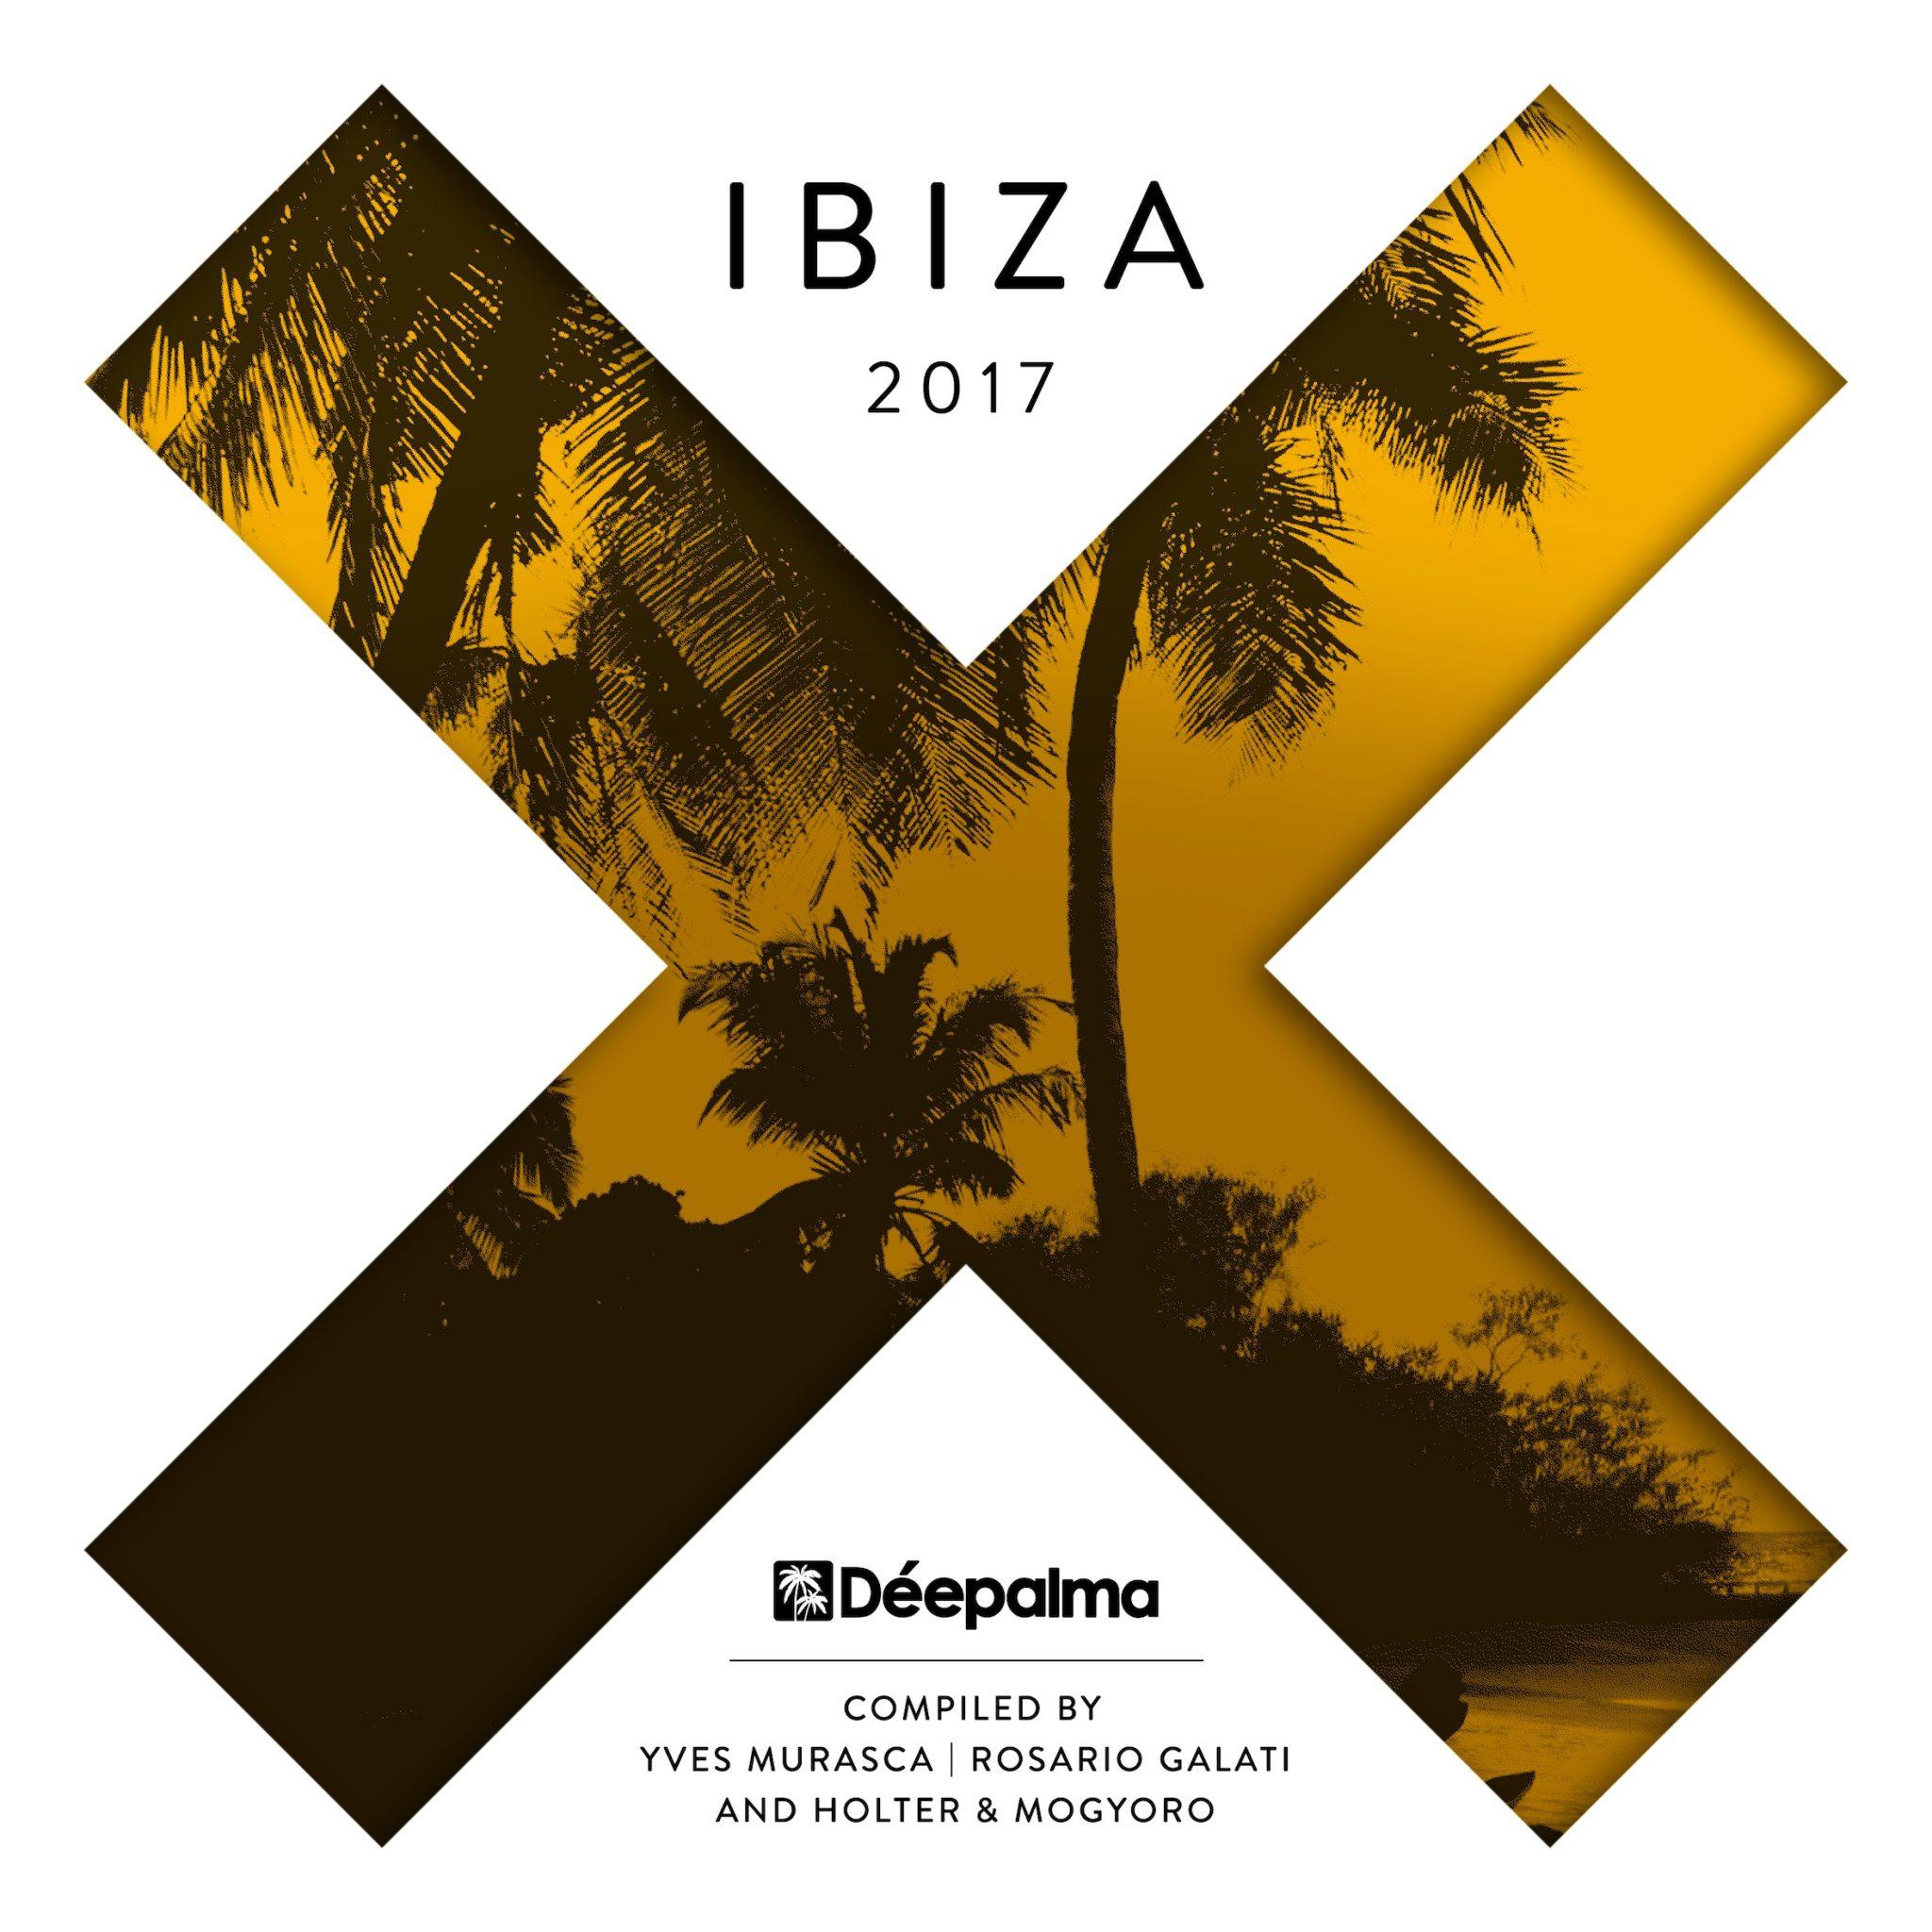 Déepalma Ibiza 2017